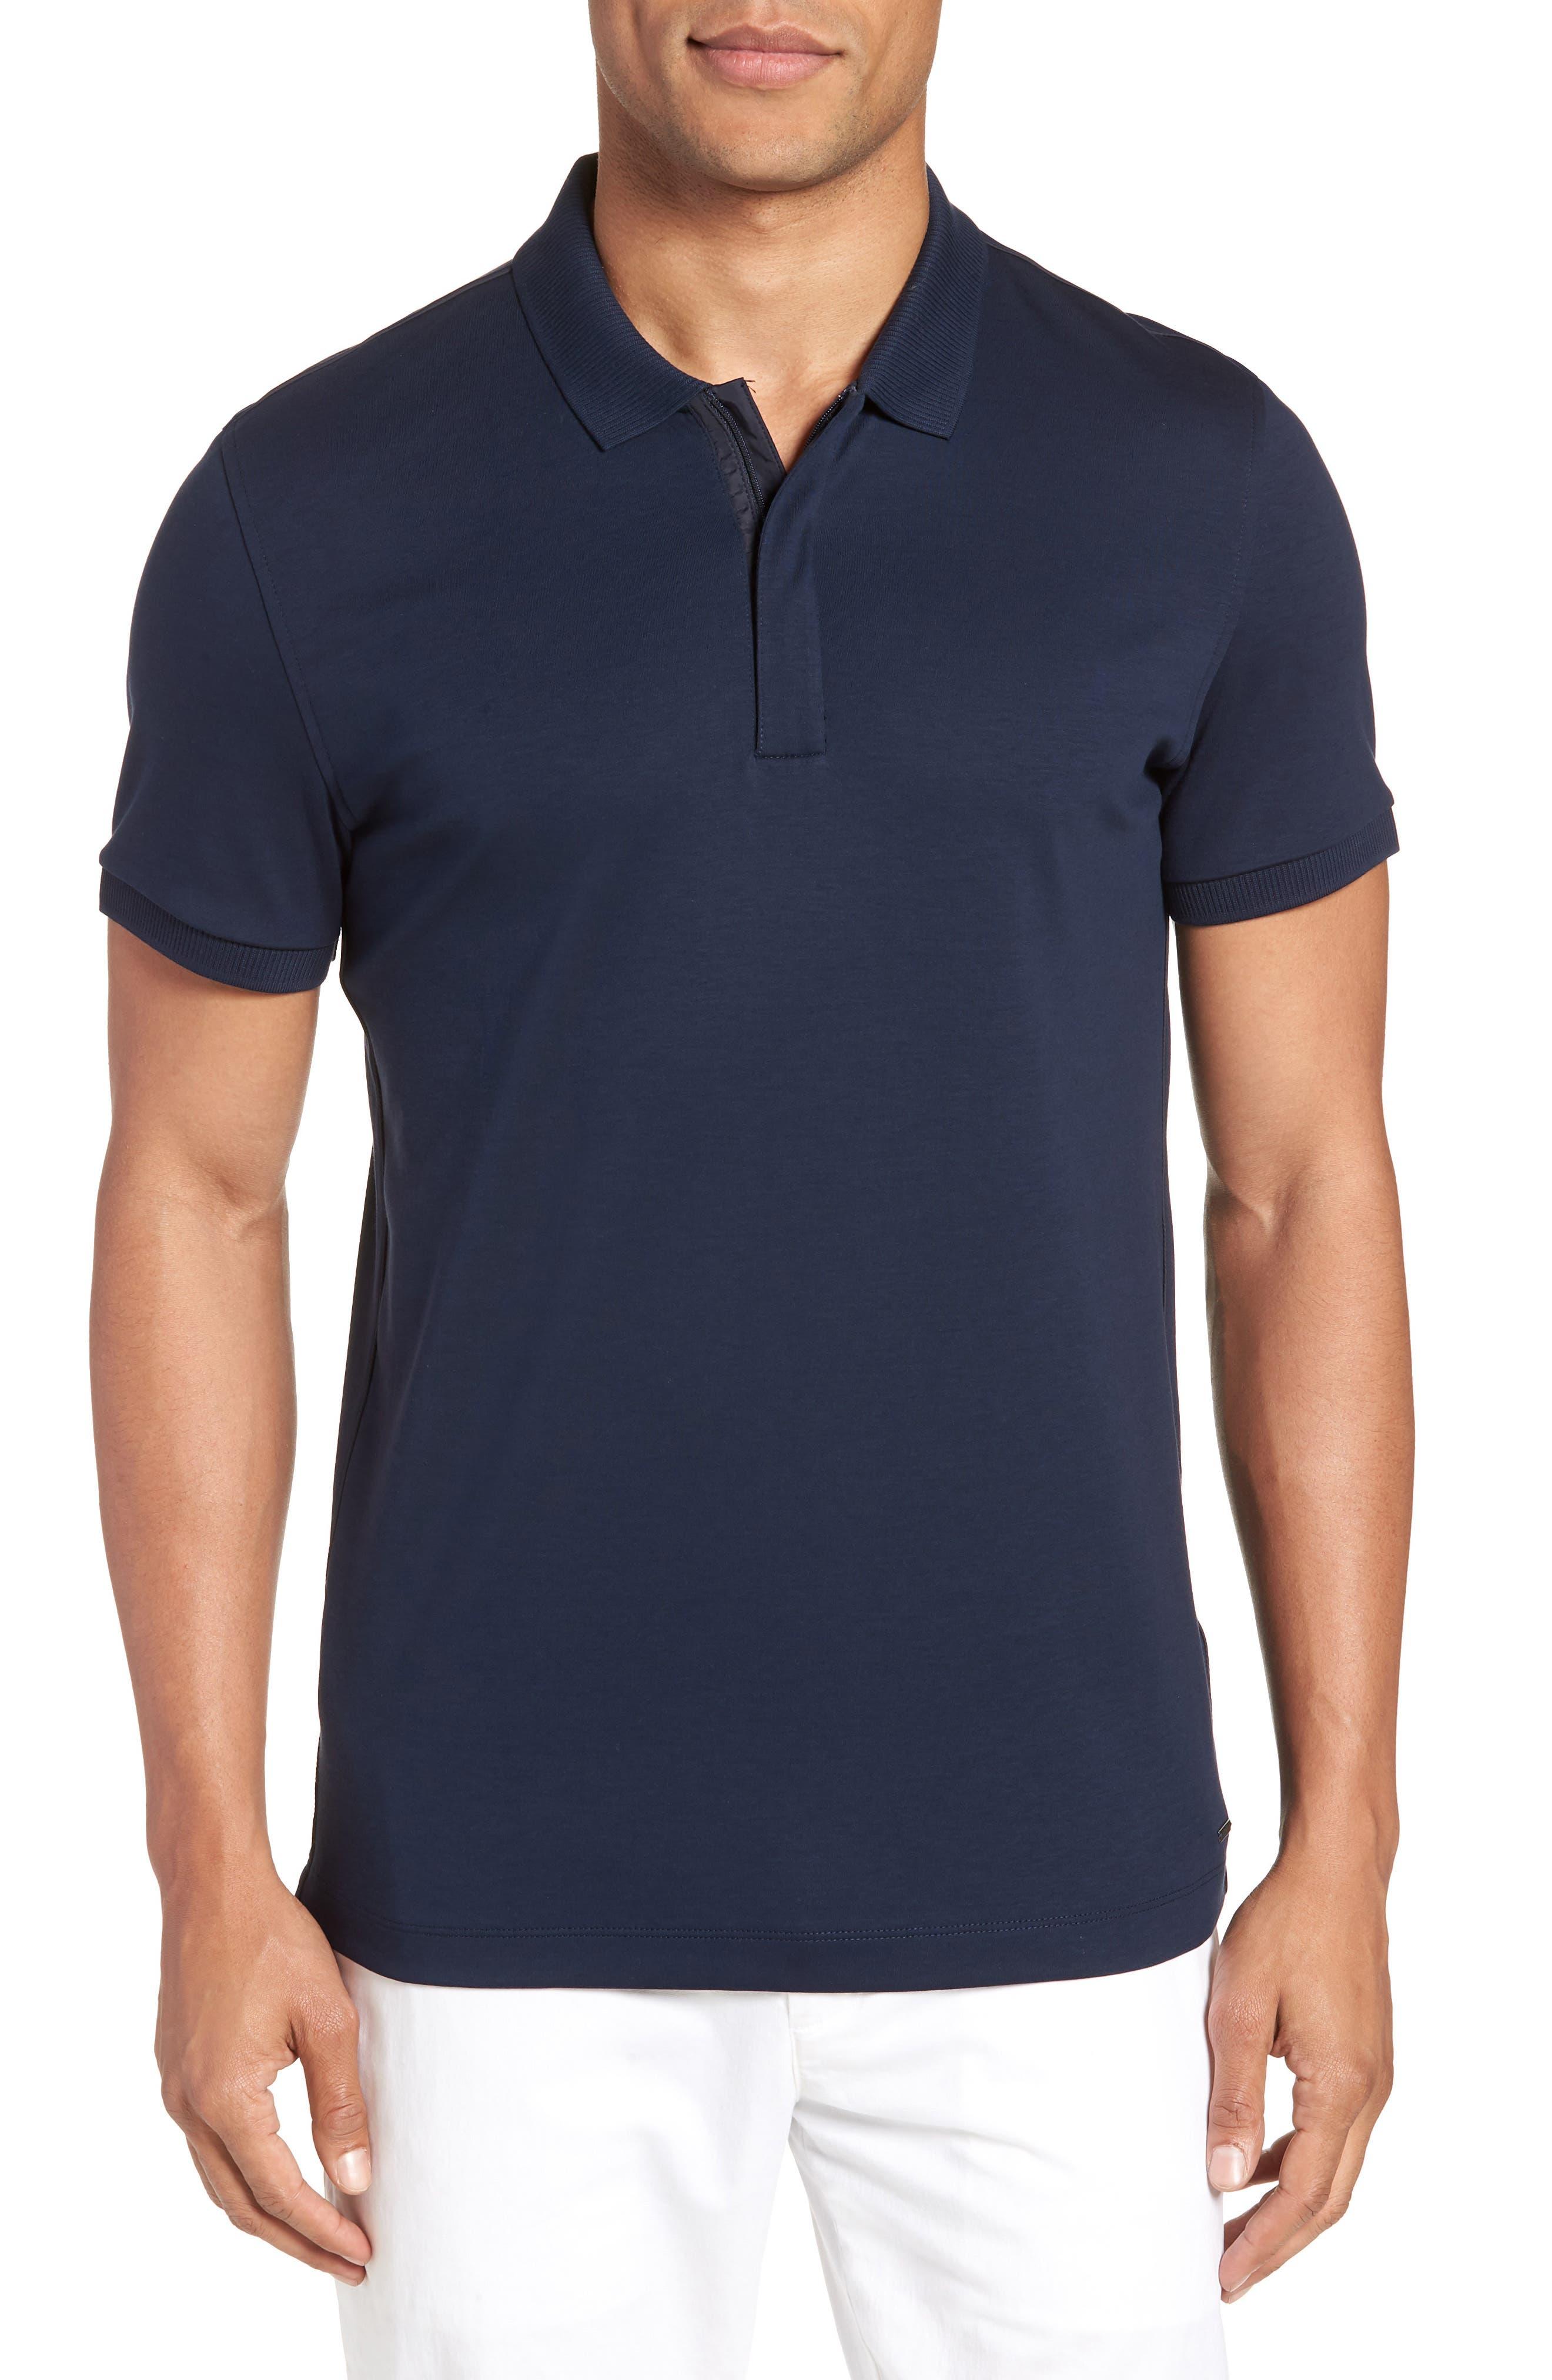 Pohl Polo Shirt,                         Main,                         color, Blue